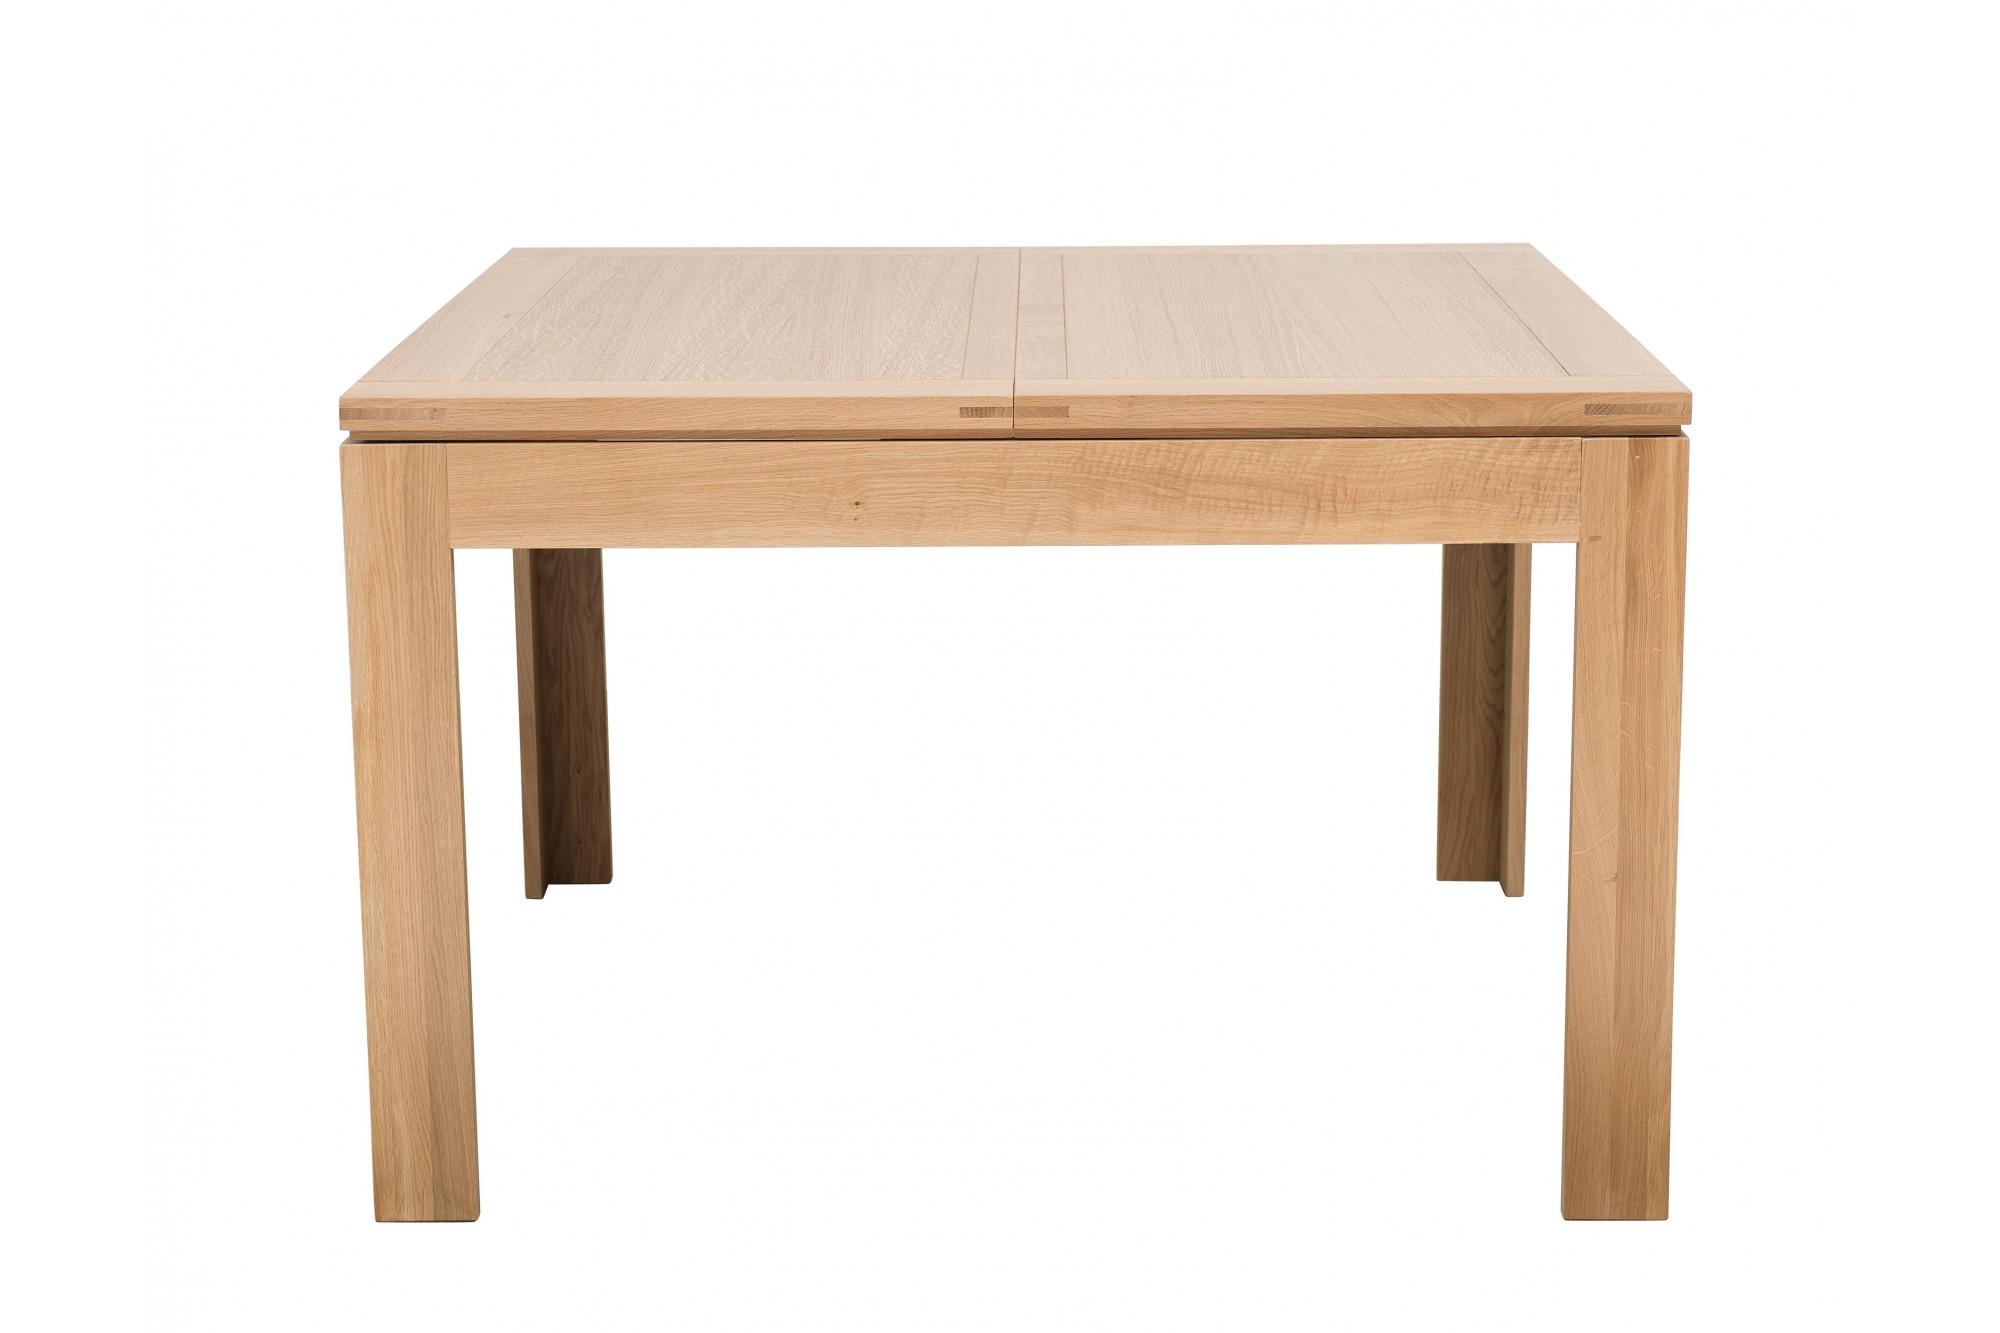 Table En Bois Chene Clair table carrée boston - bois chêne clair massif